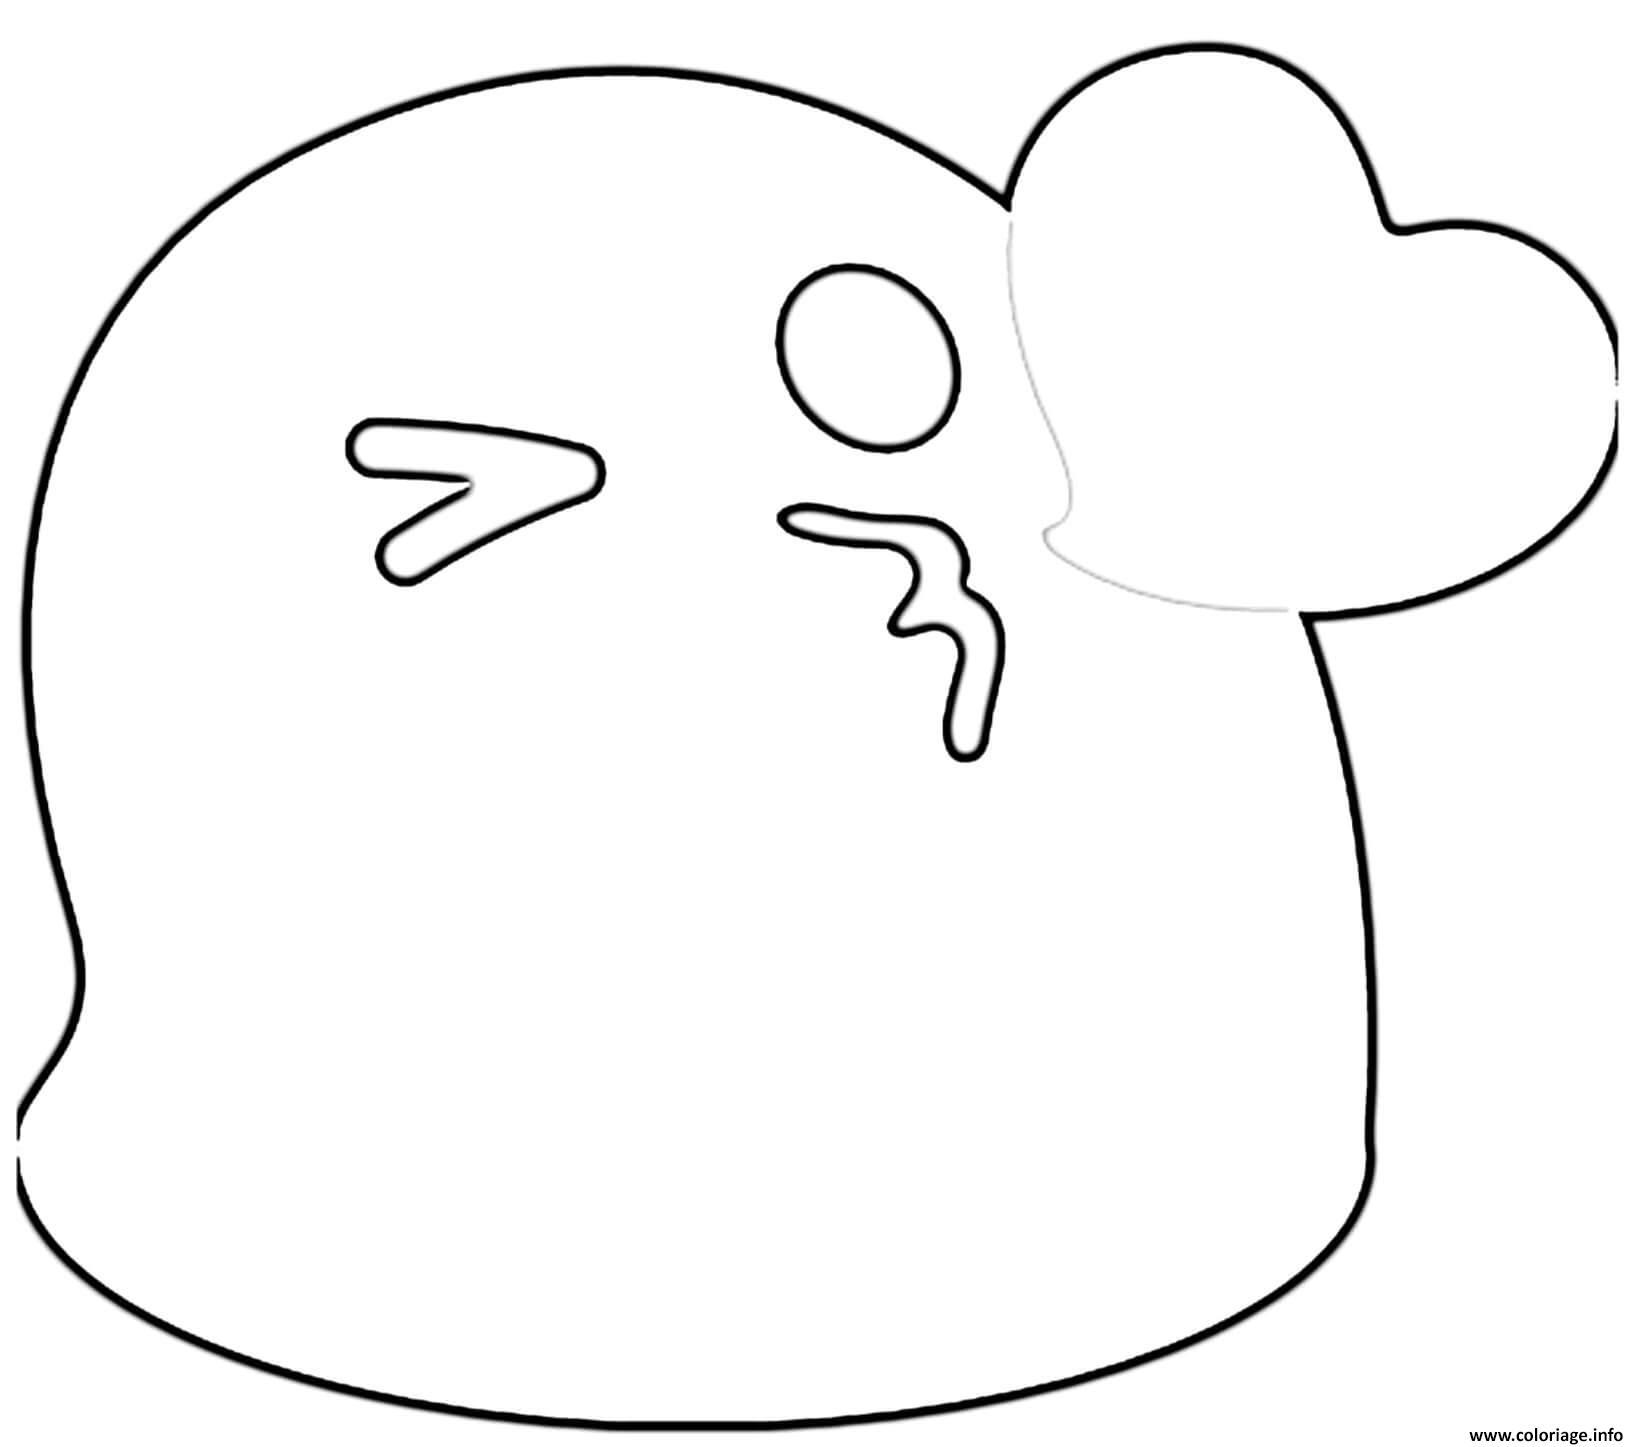 Dessin Google Emoji Kiss Coloriage Gratuit à Imprimer